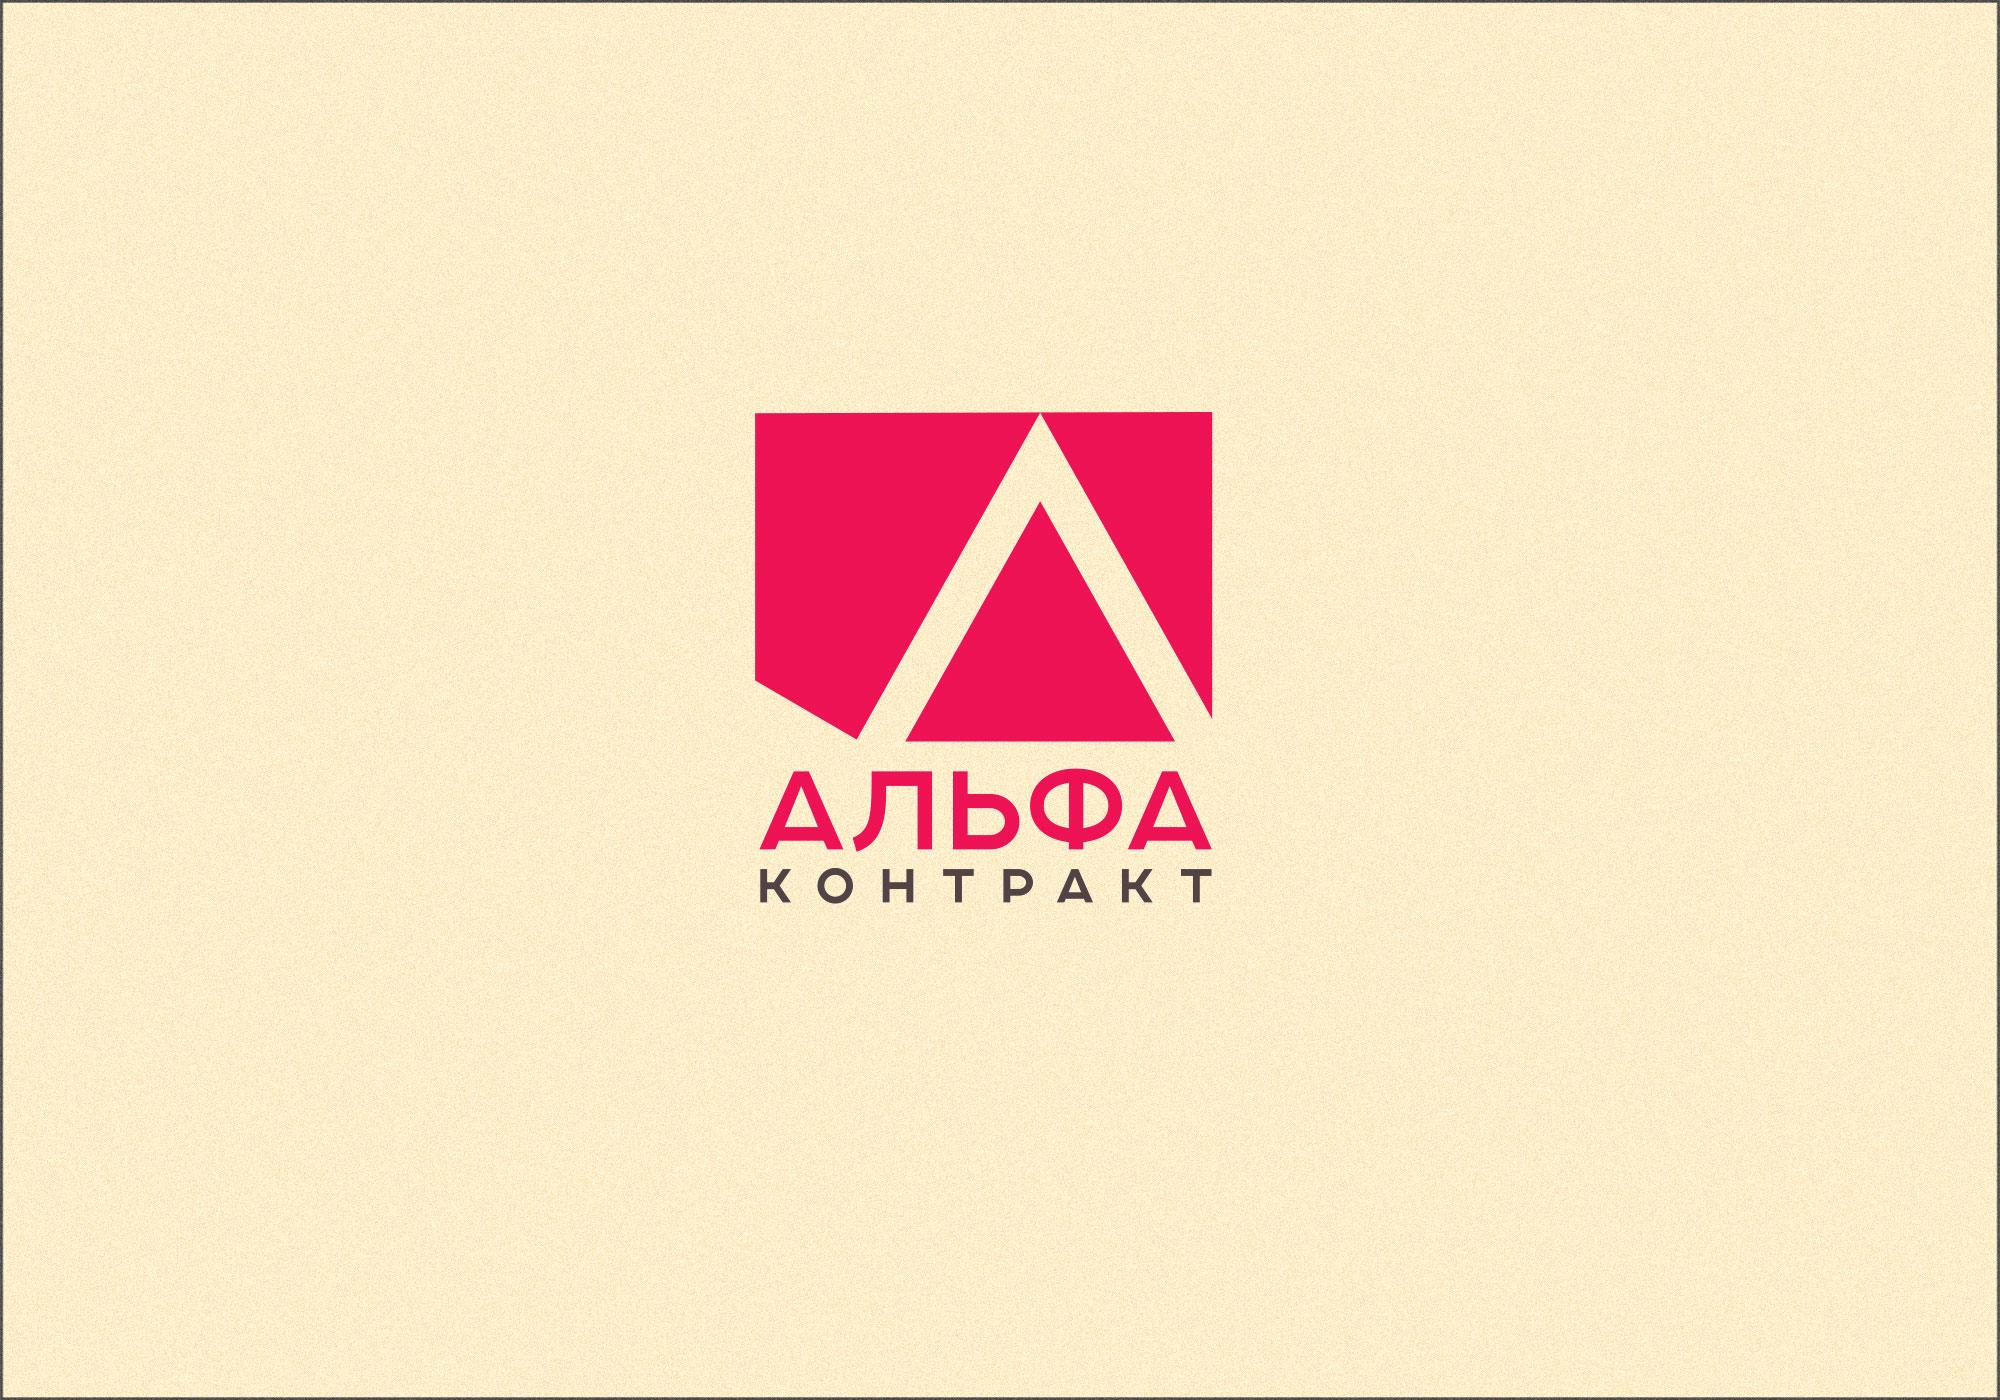 Дизайнер для разработки логотипа компании фото f_6625bf968c288895.jpg